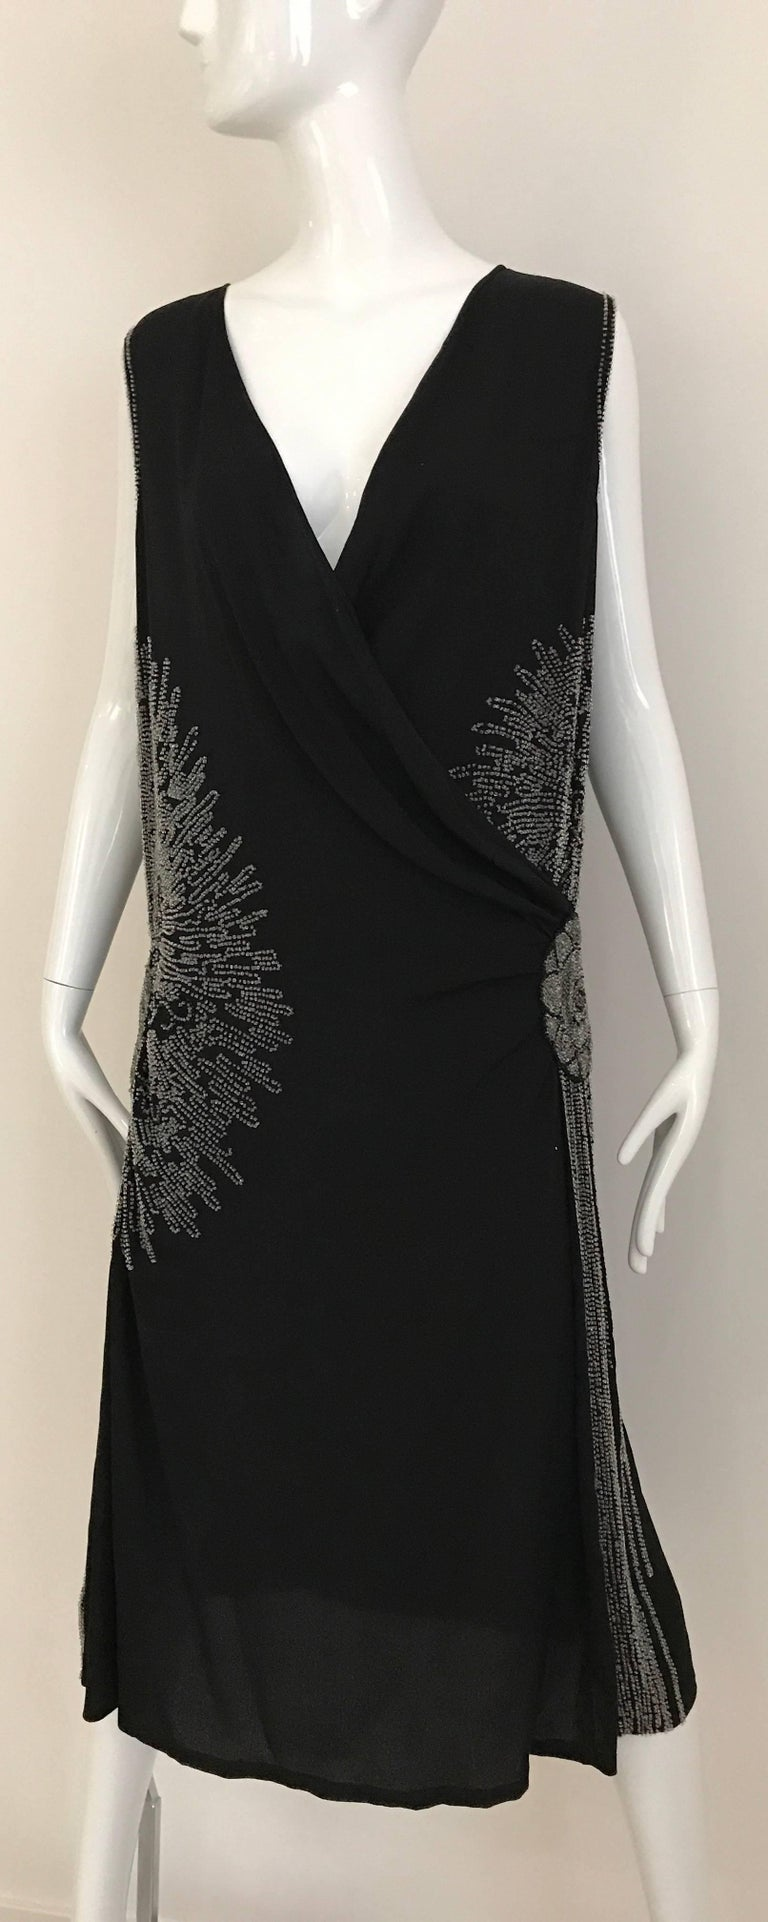 Women's 1920s Black Silk Beaded Flapper Dress Large size For Sale